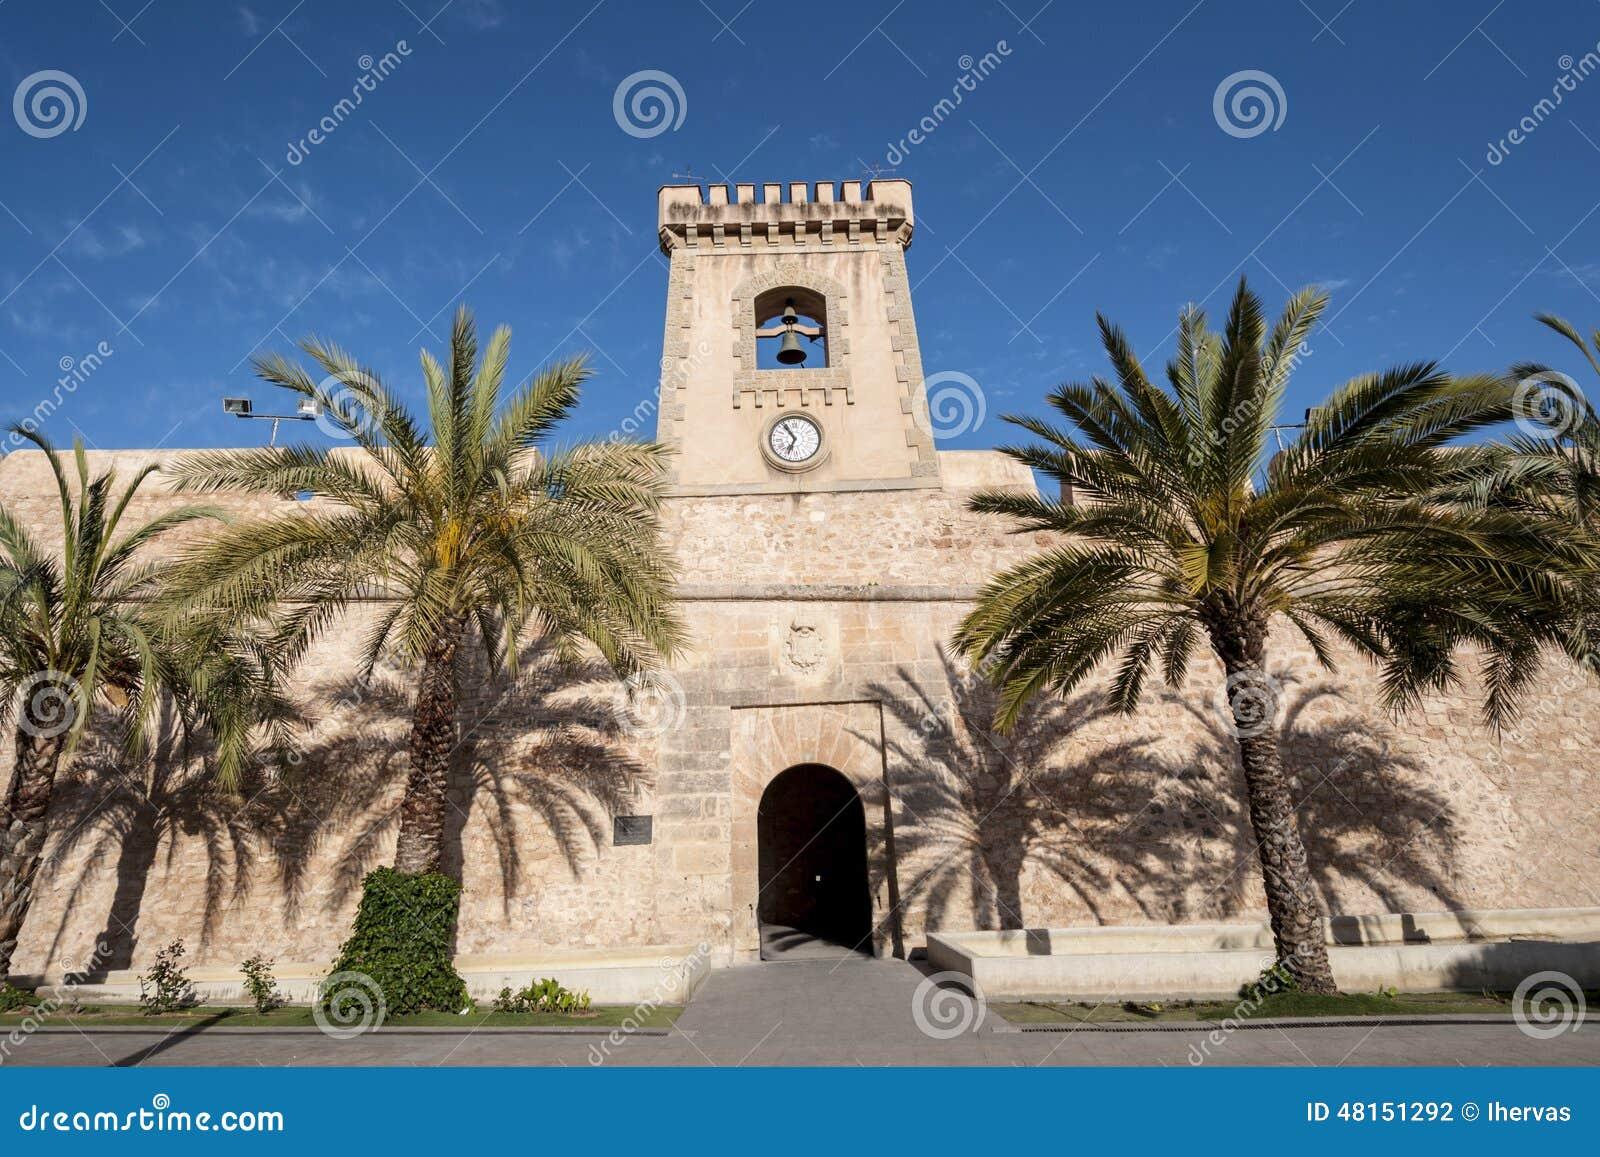 Kasteel van Santa Pola